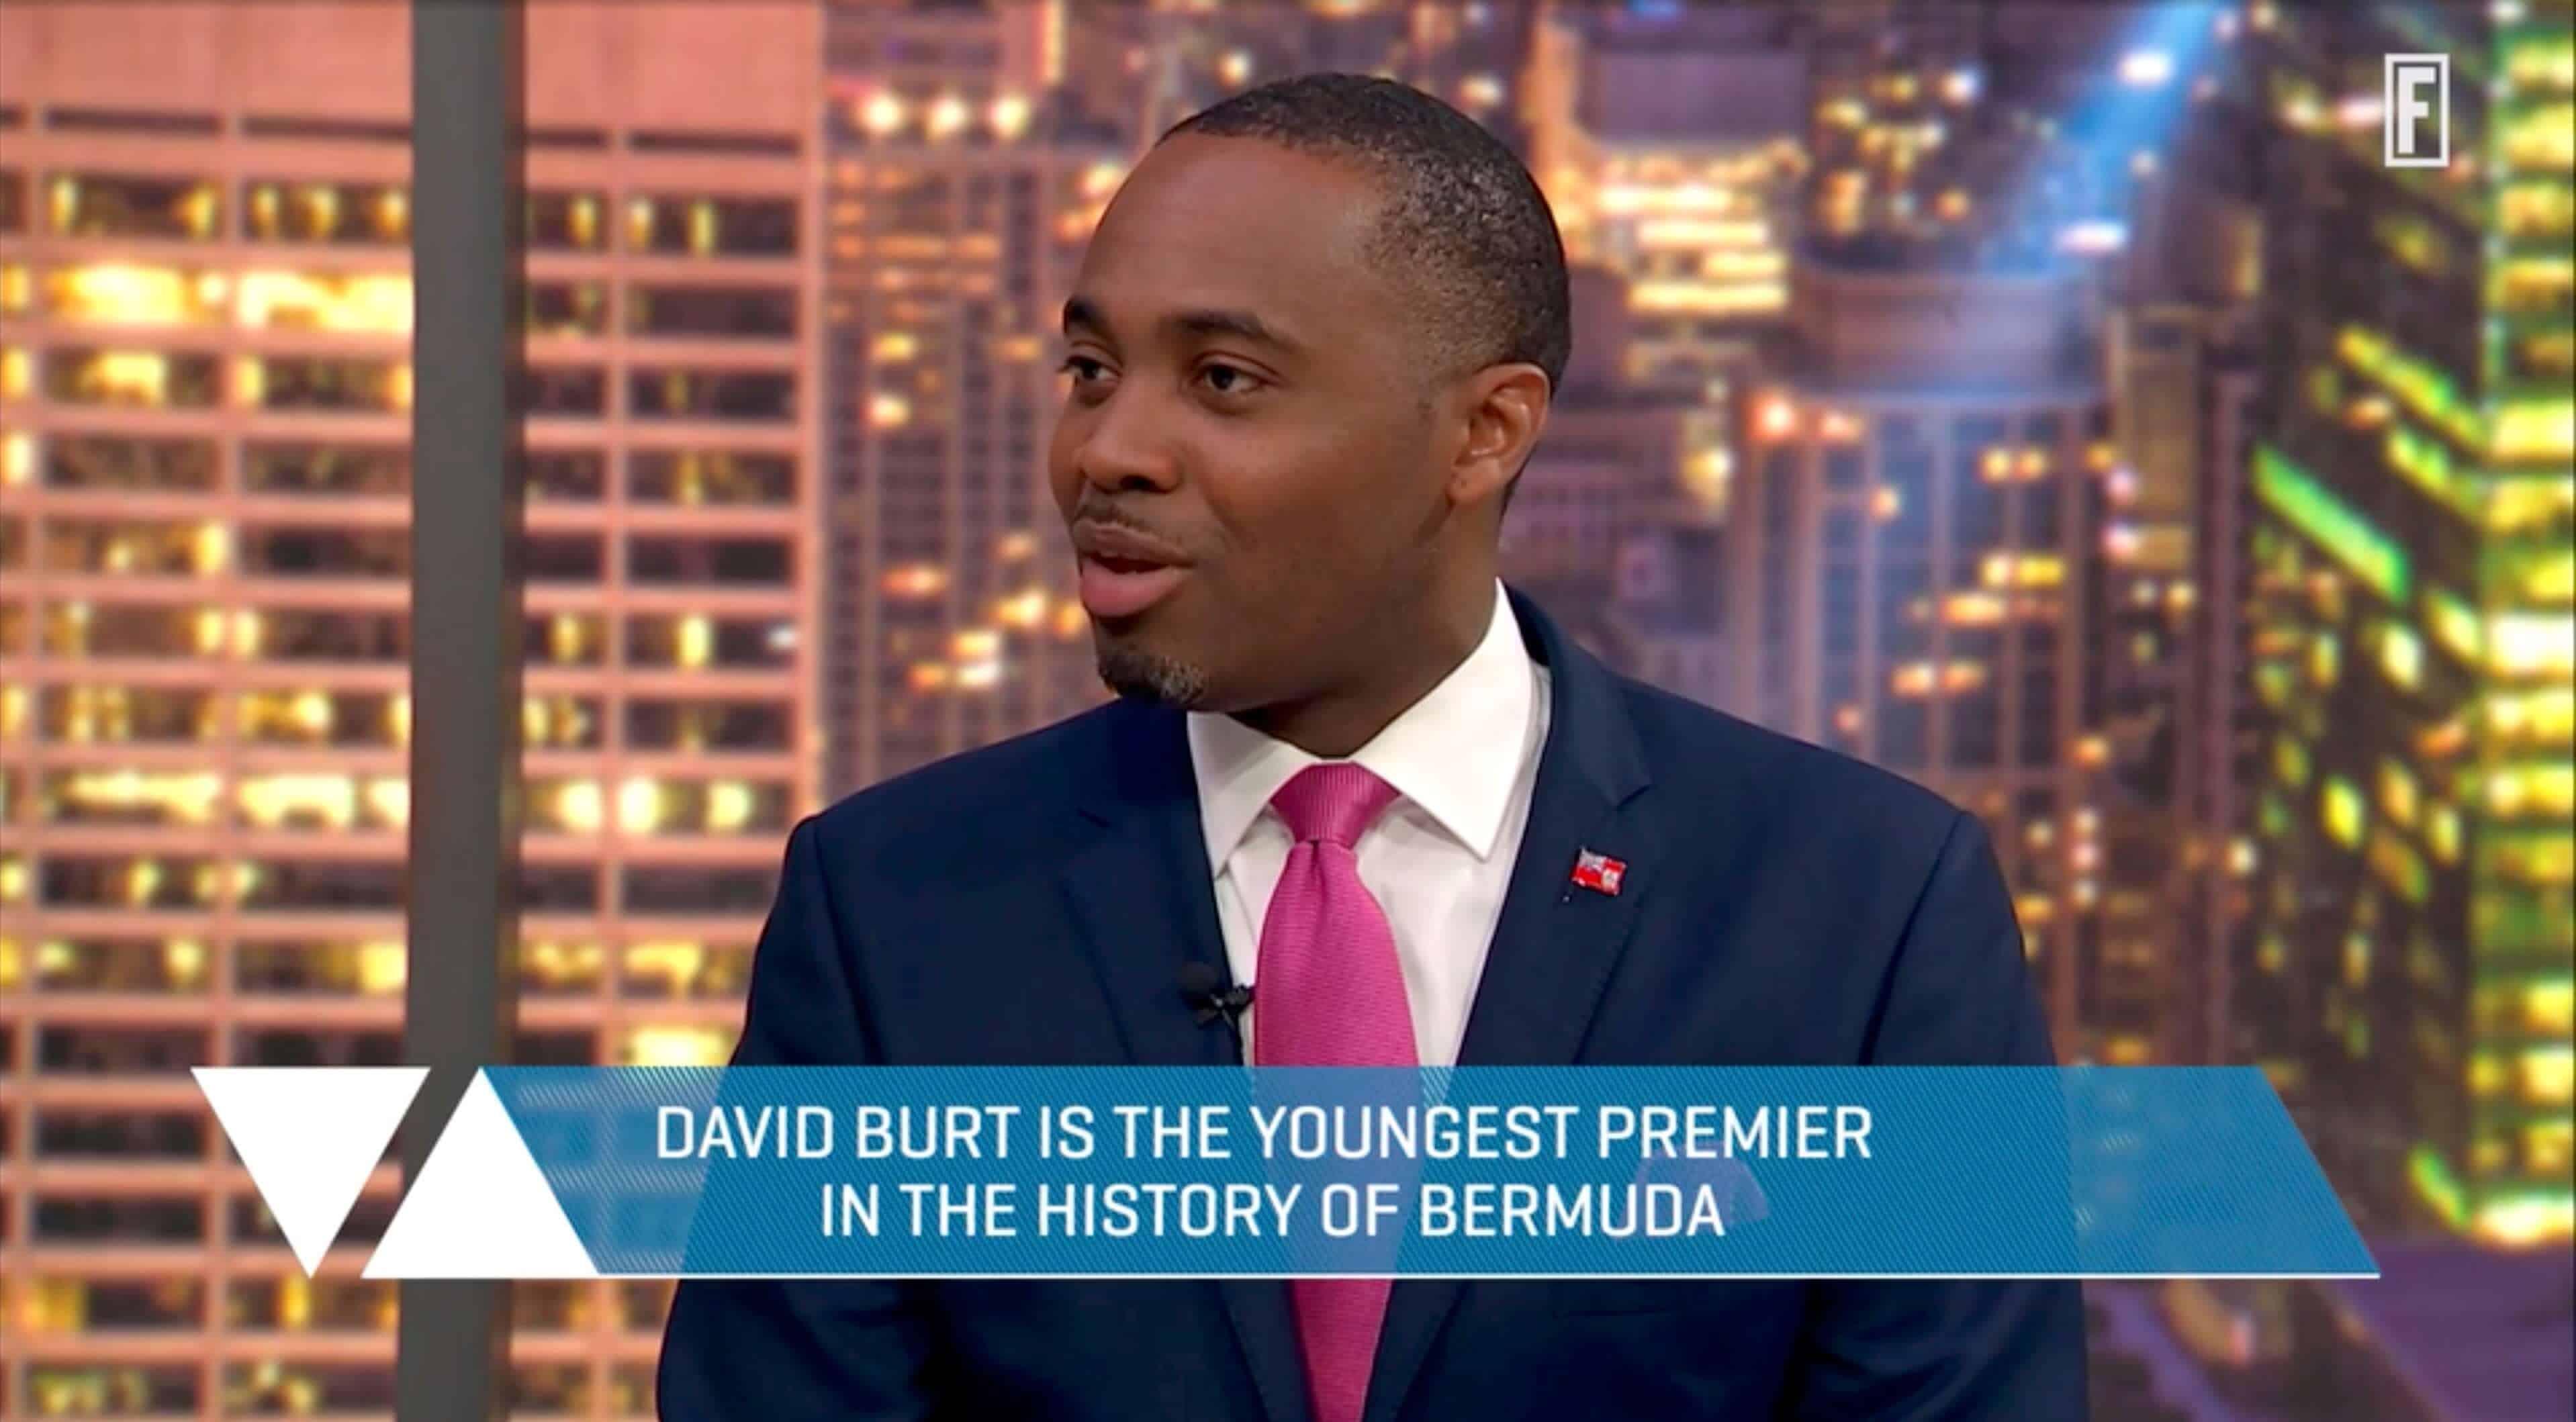 david-burt-premier-bermuda